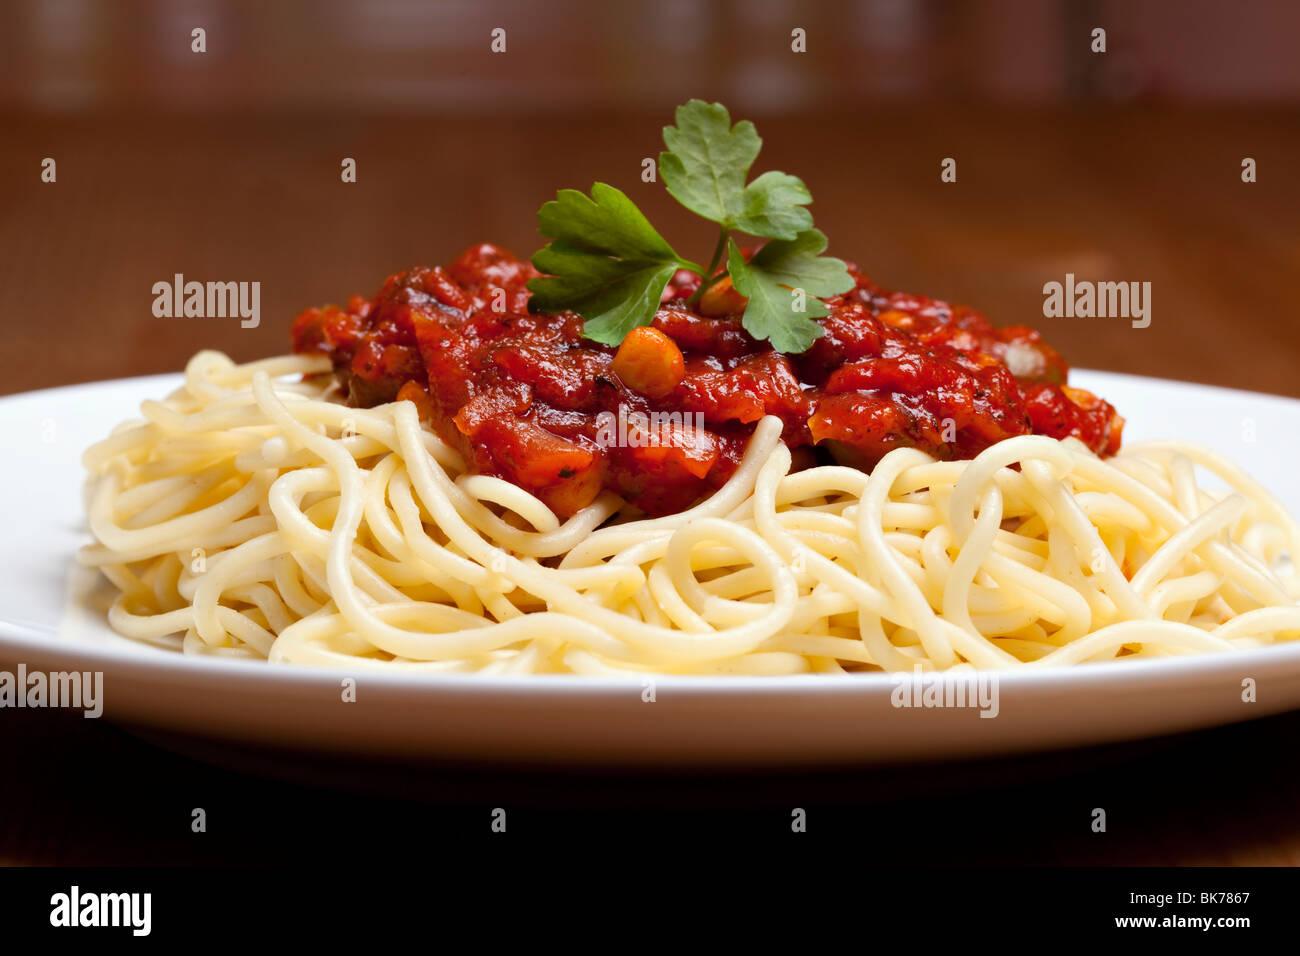 Los espaguetis a la boloñesa, comida italiana tradicional Imagen De Stock